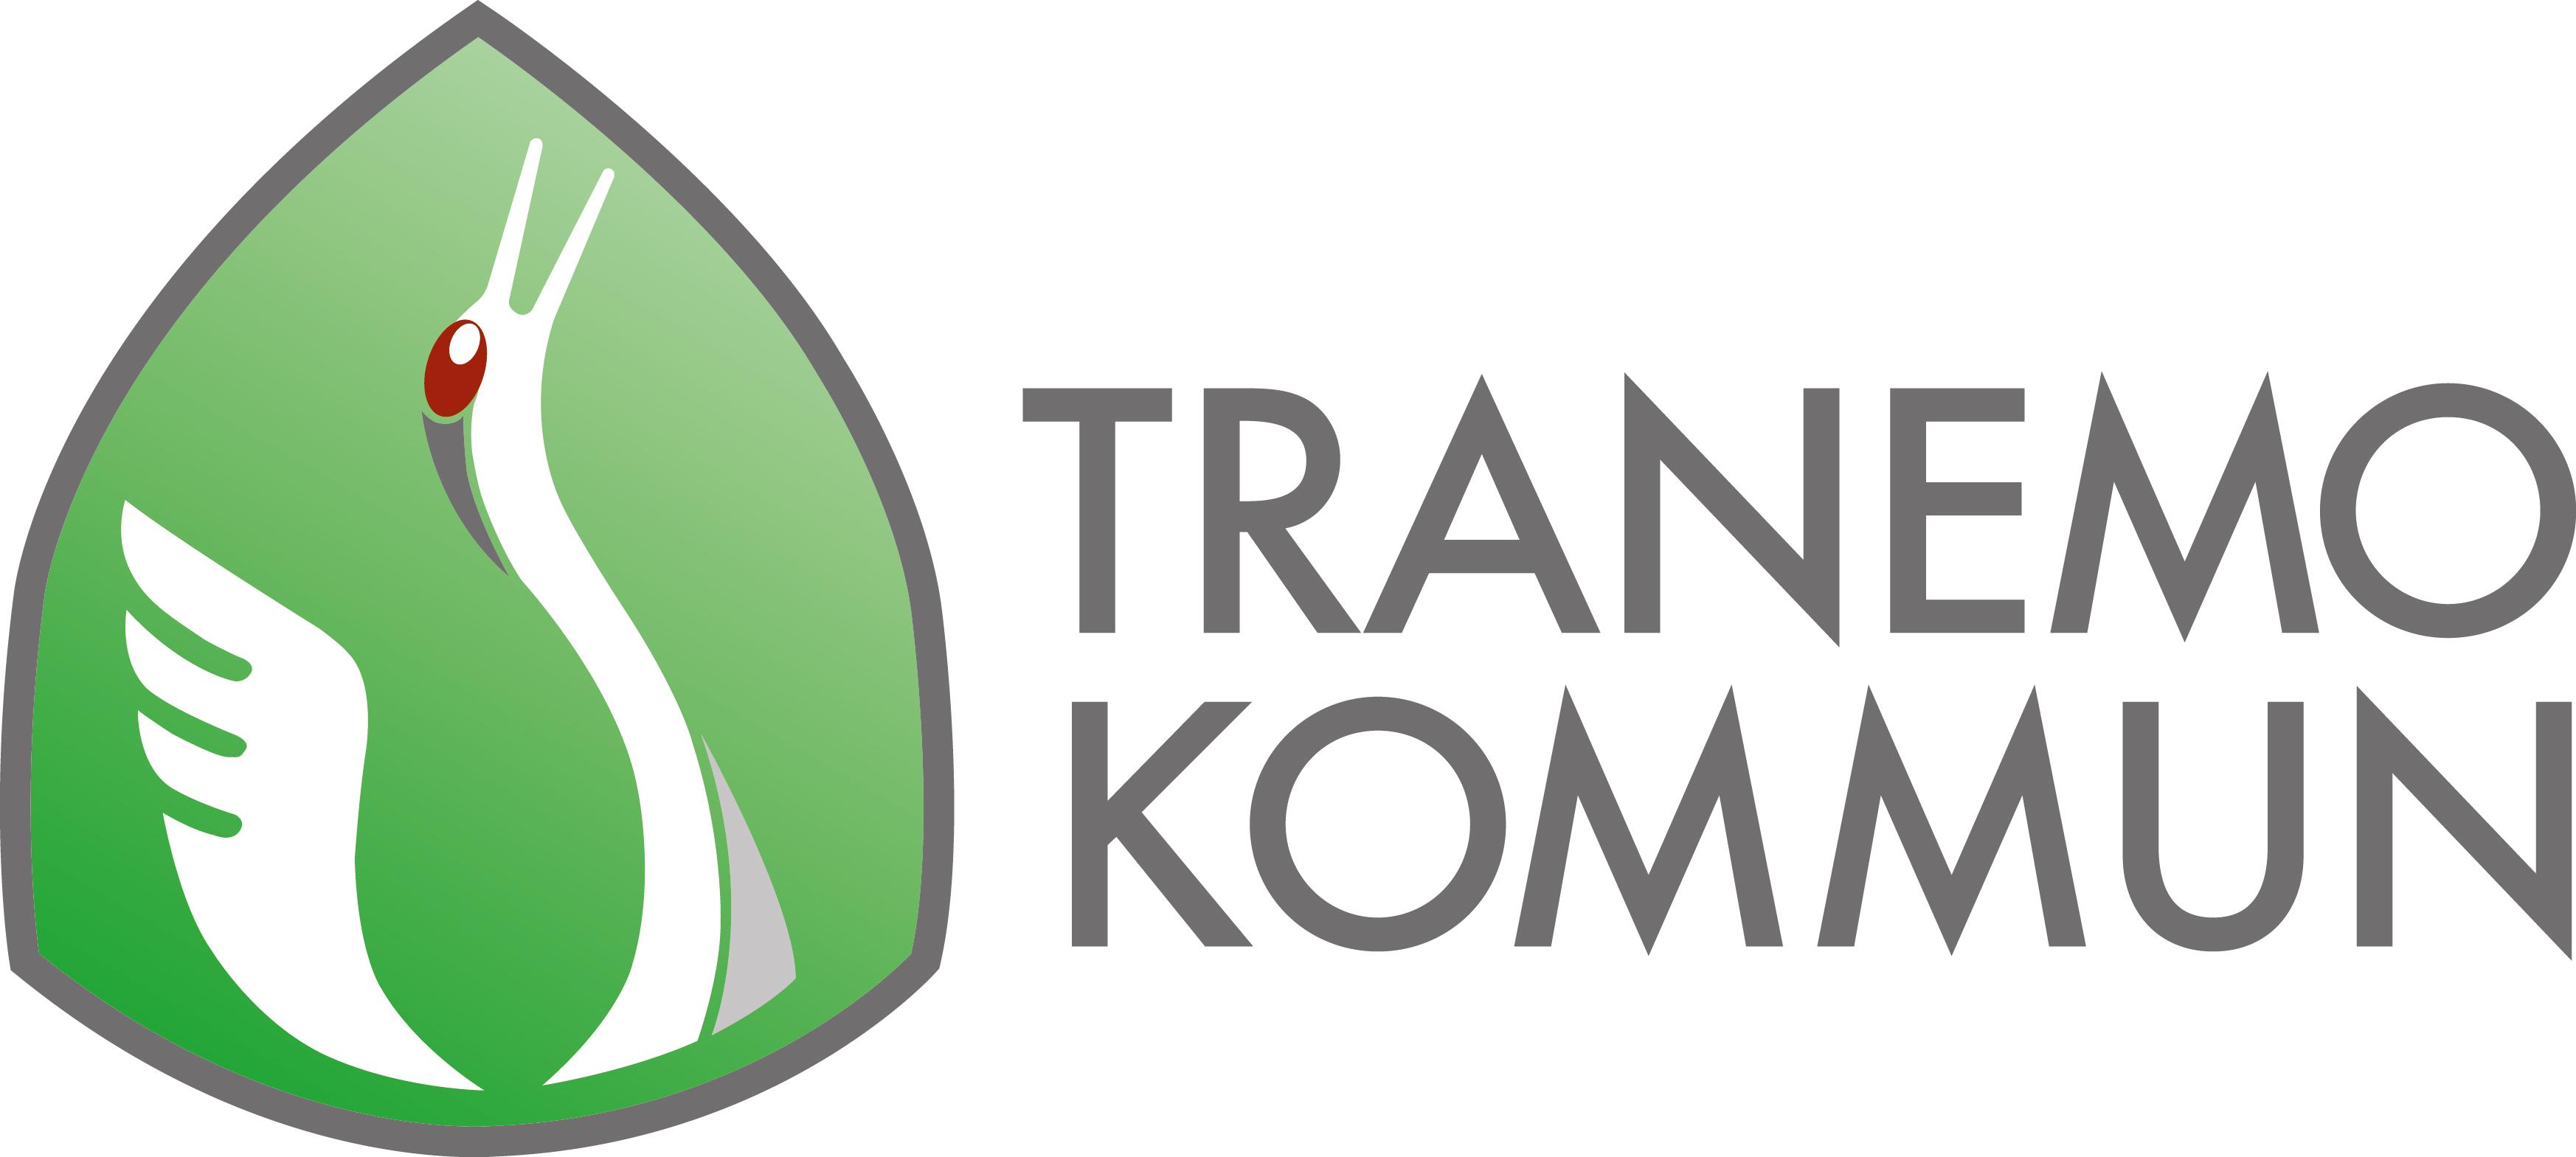 Image result for tranemo kommun